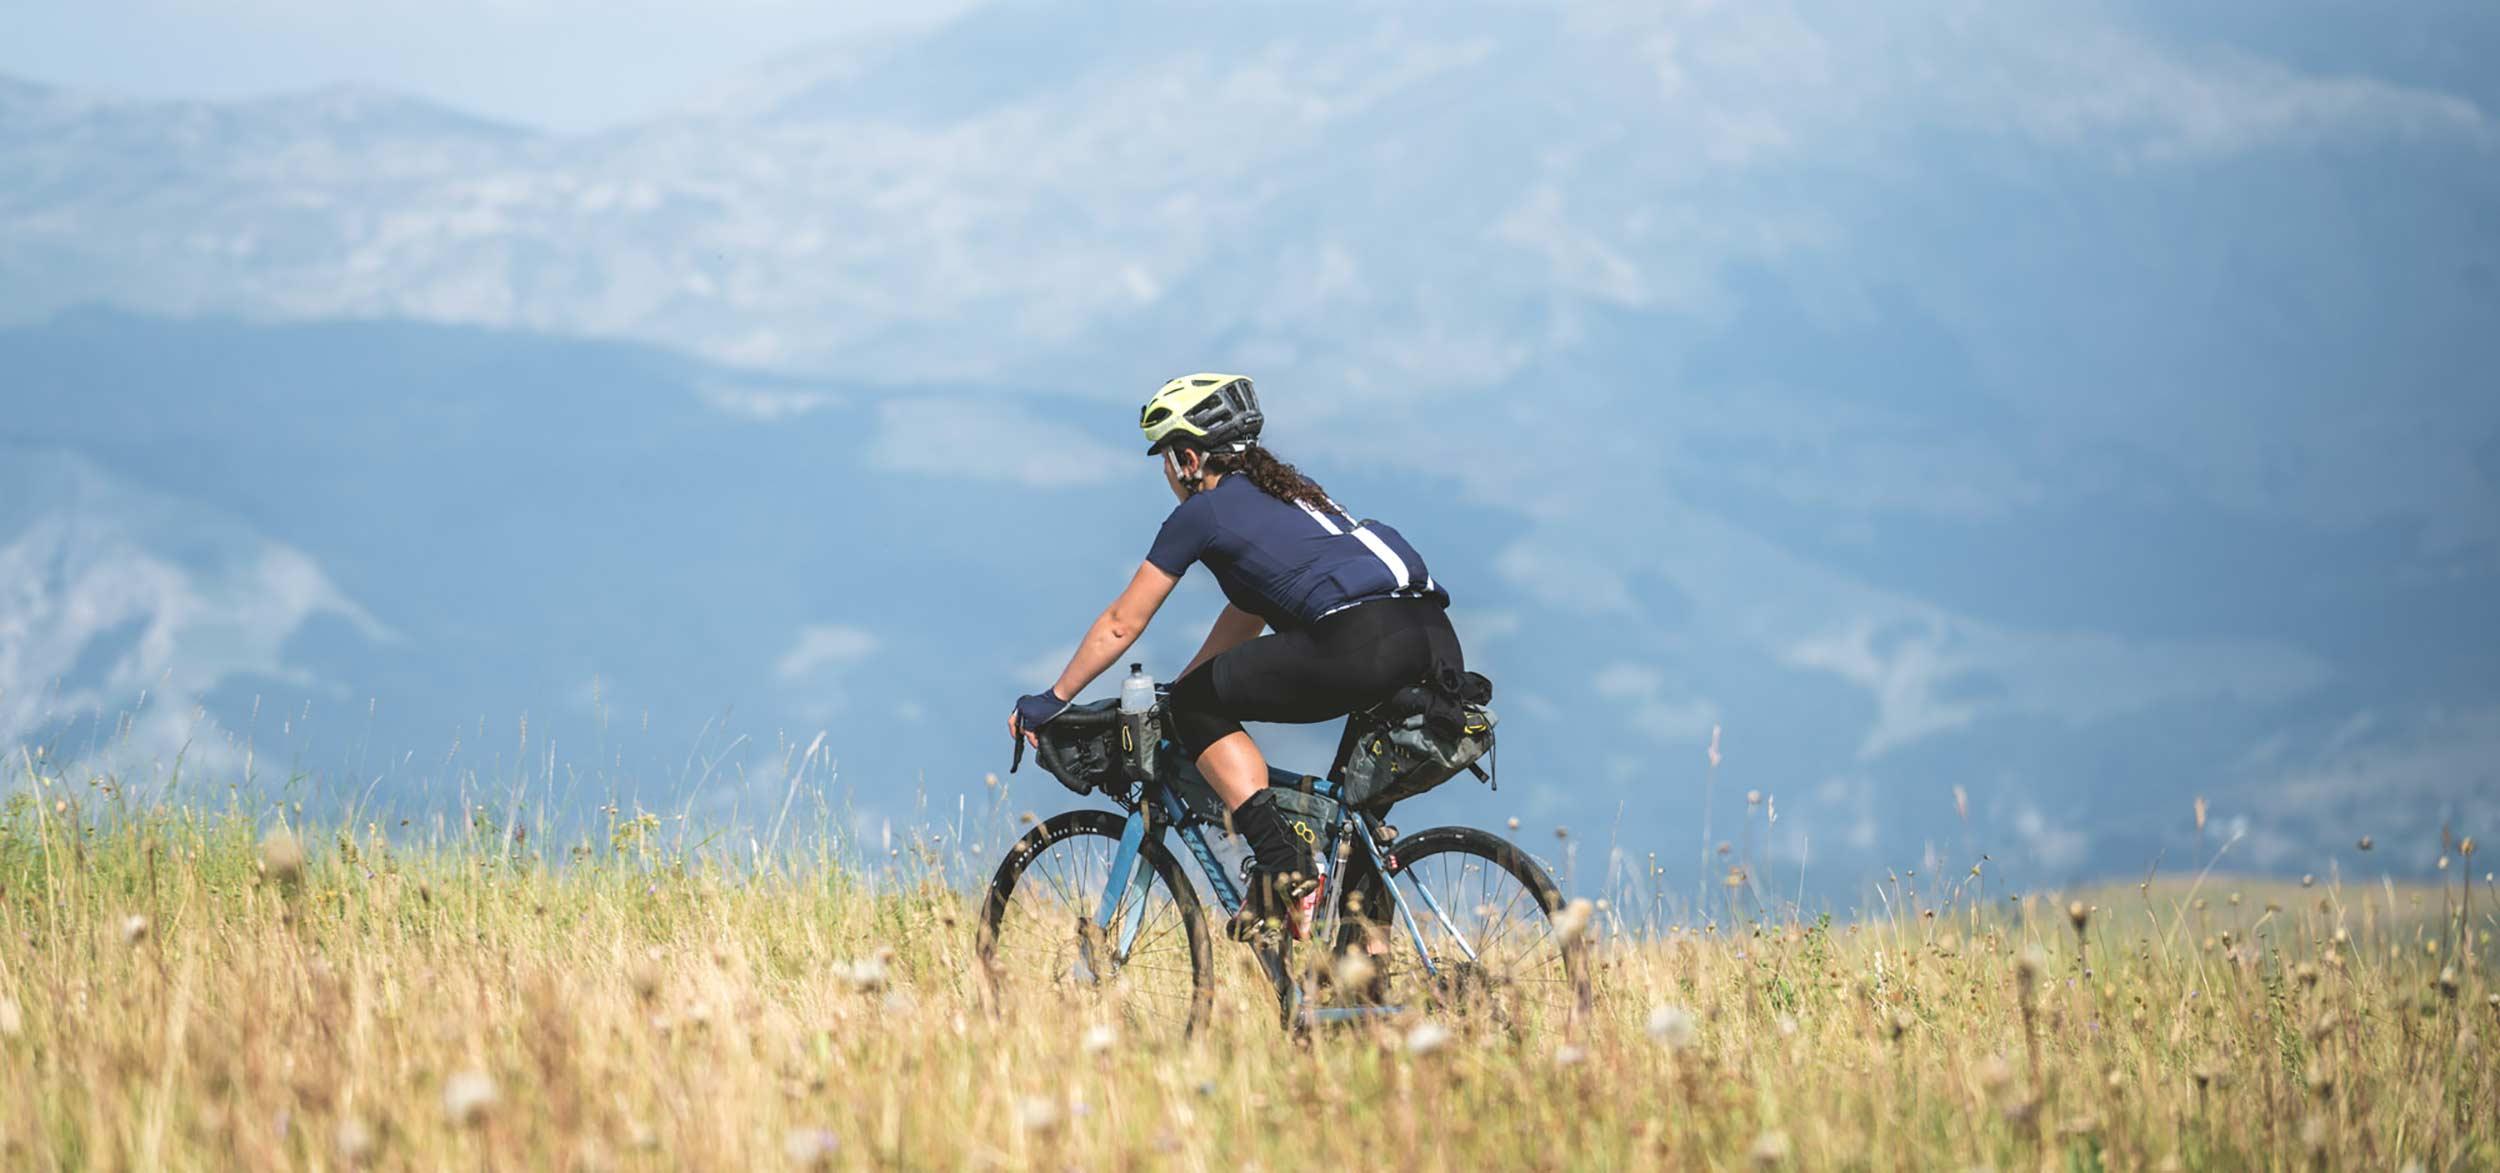 A woman bikepacking racing down a dry grass field